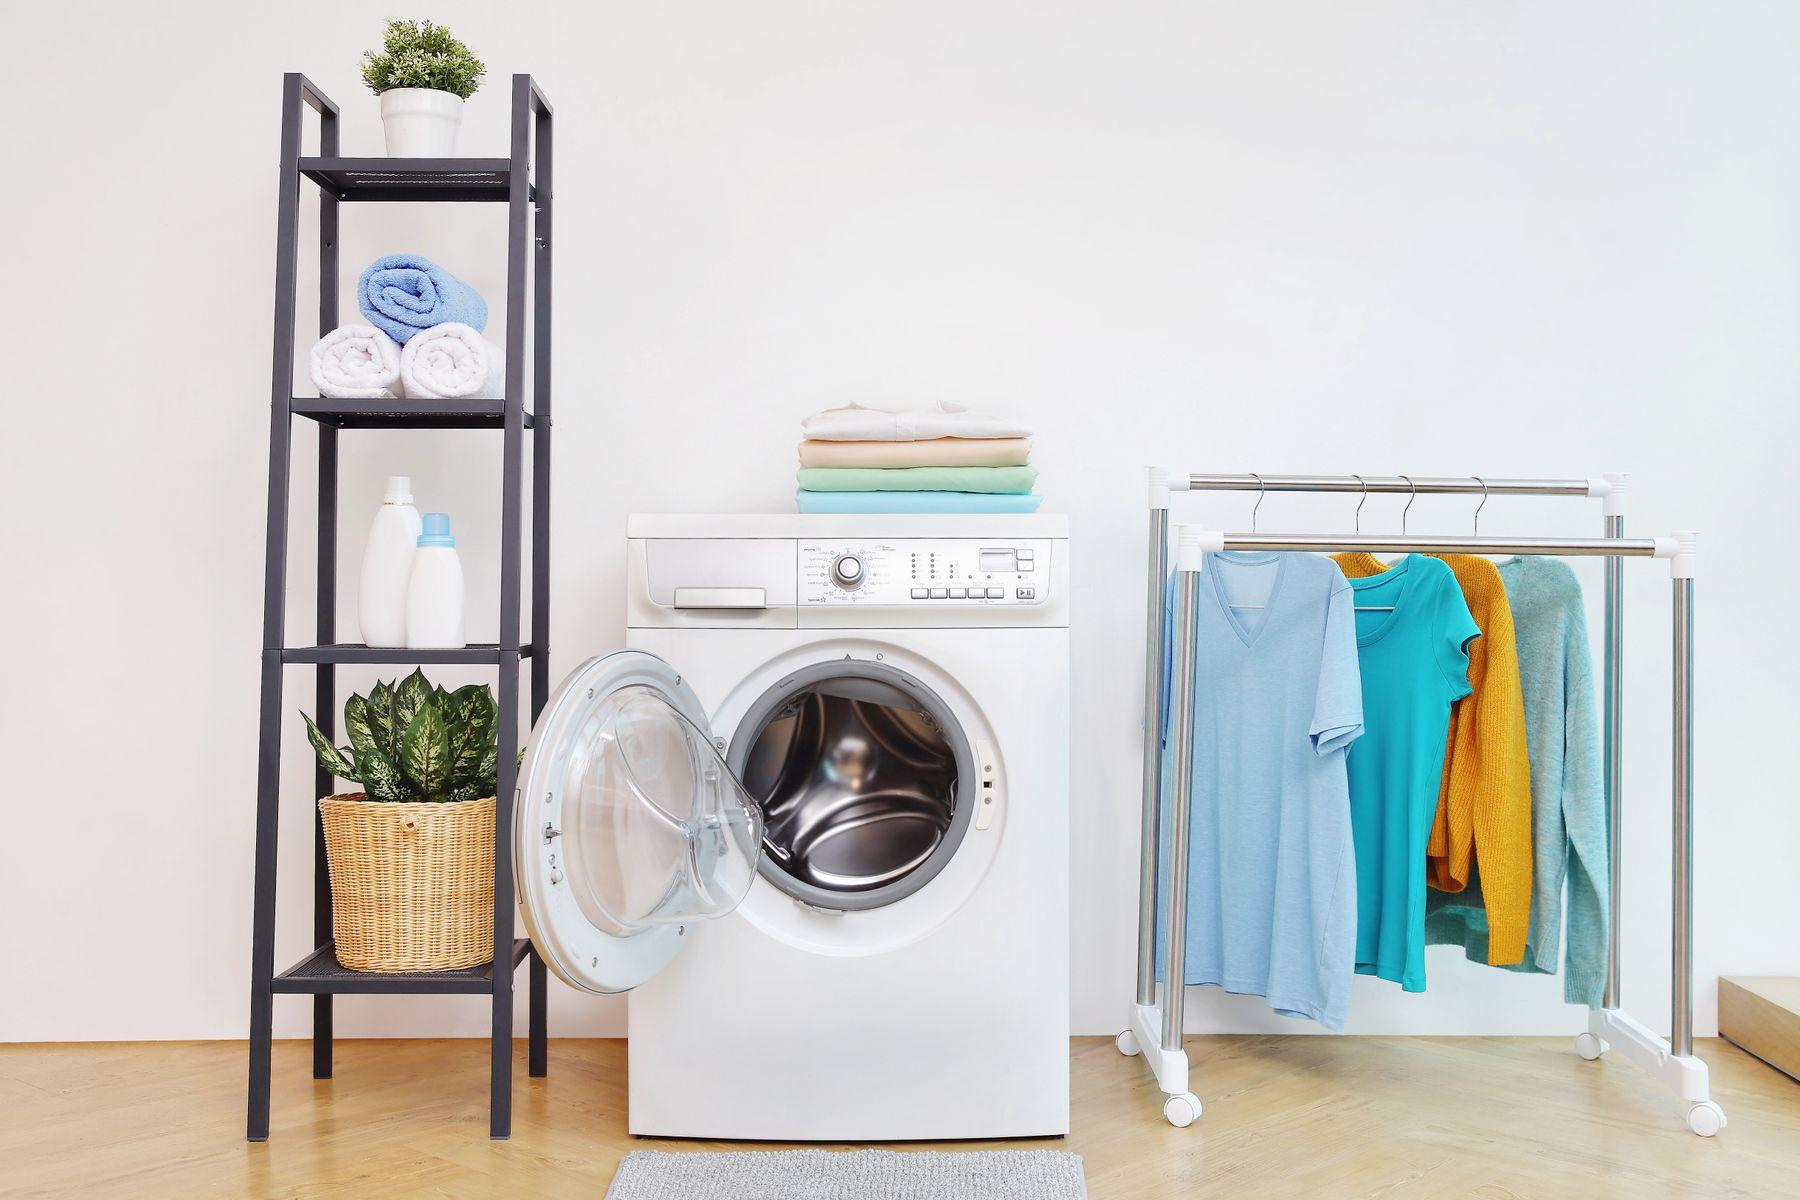 Using a Washing Machine